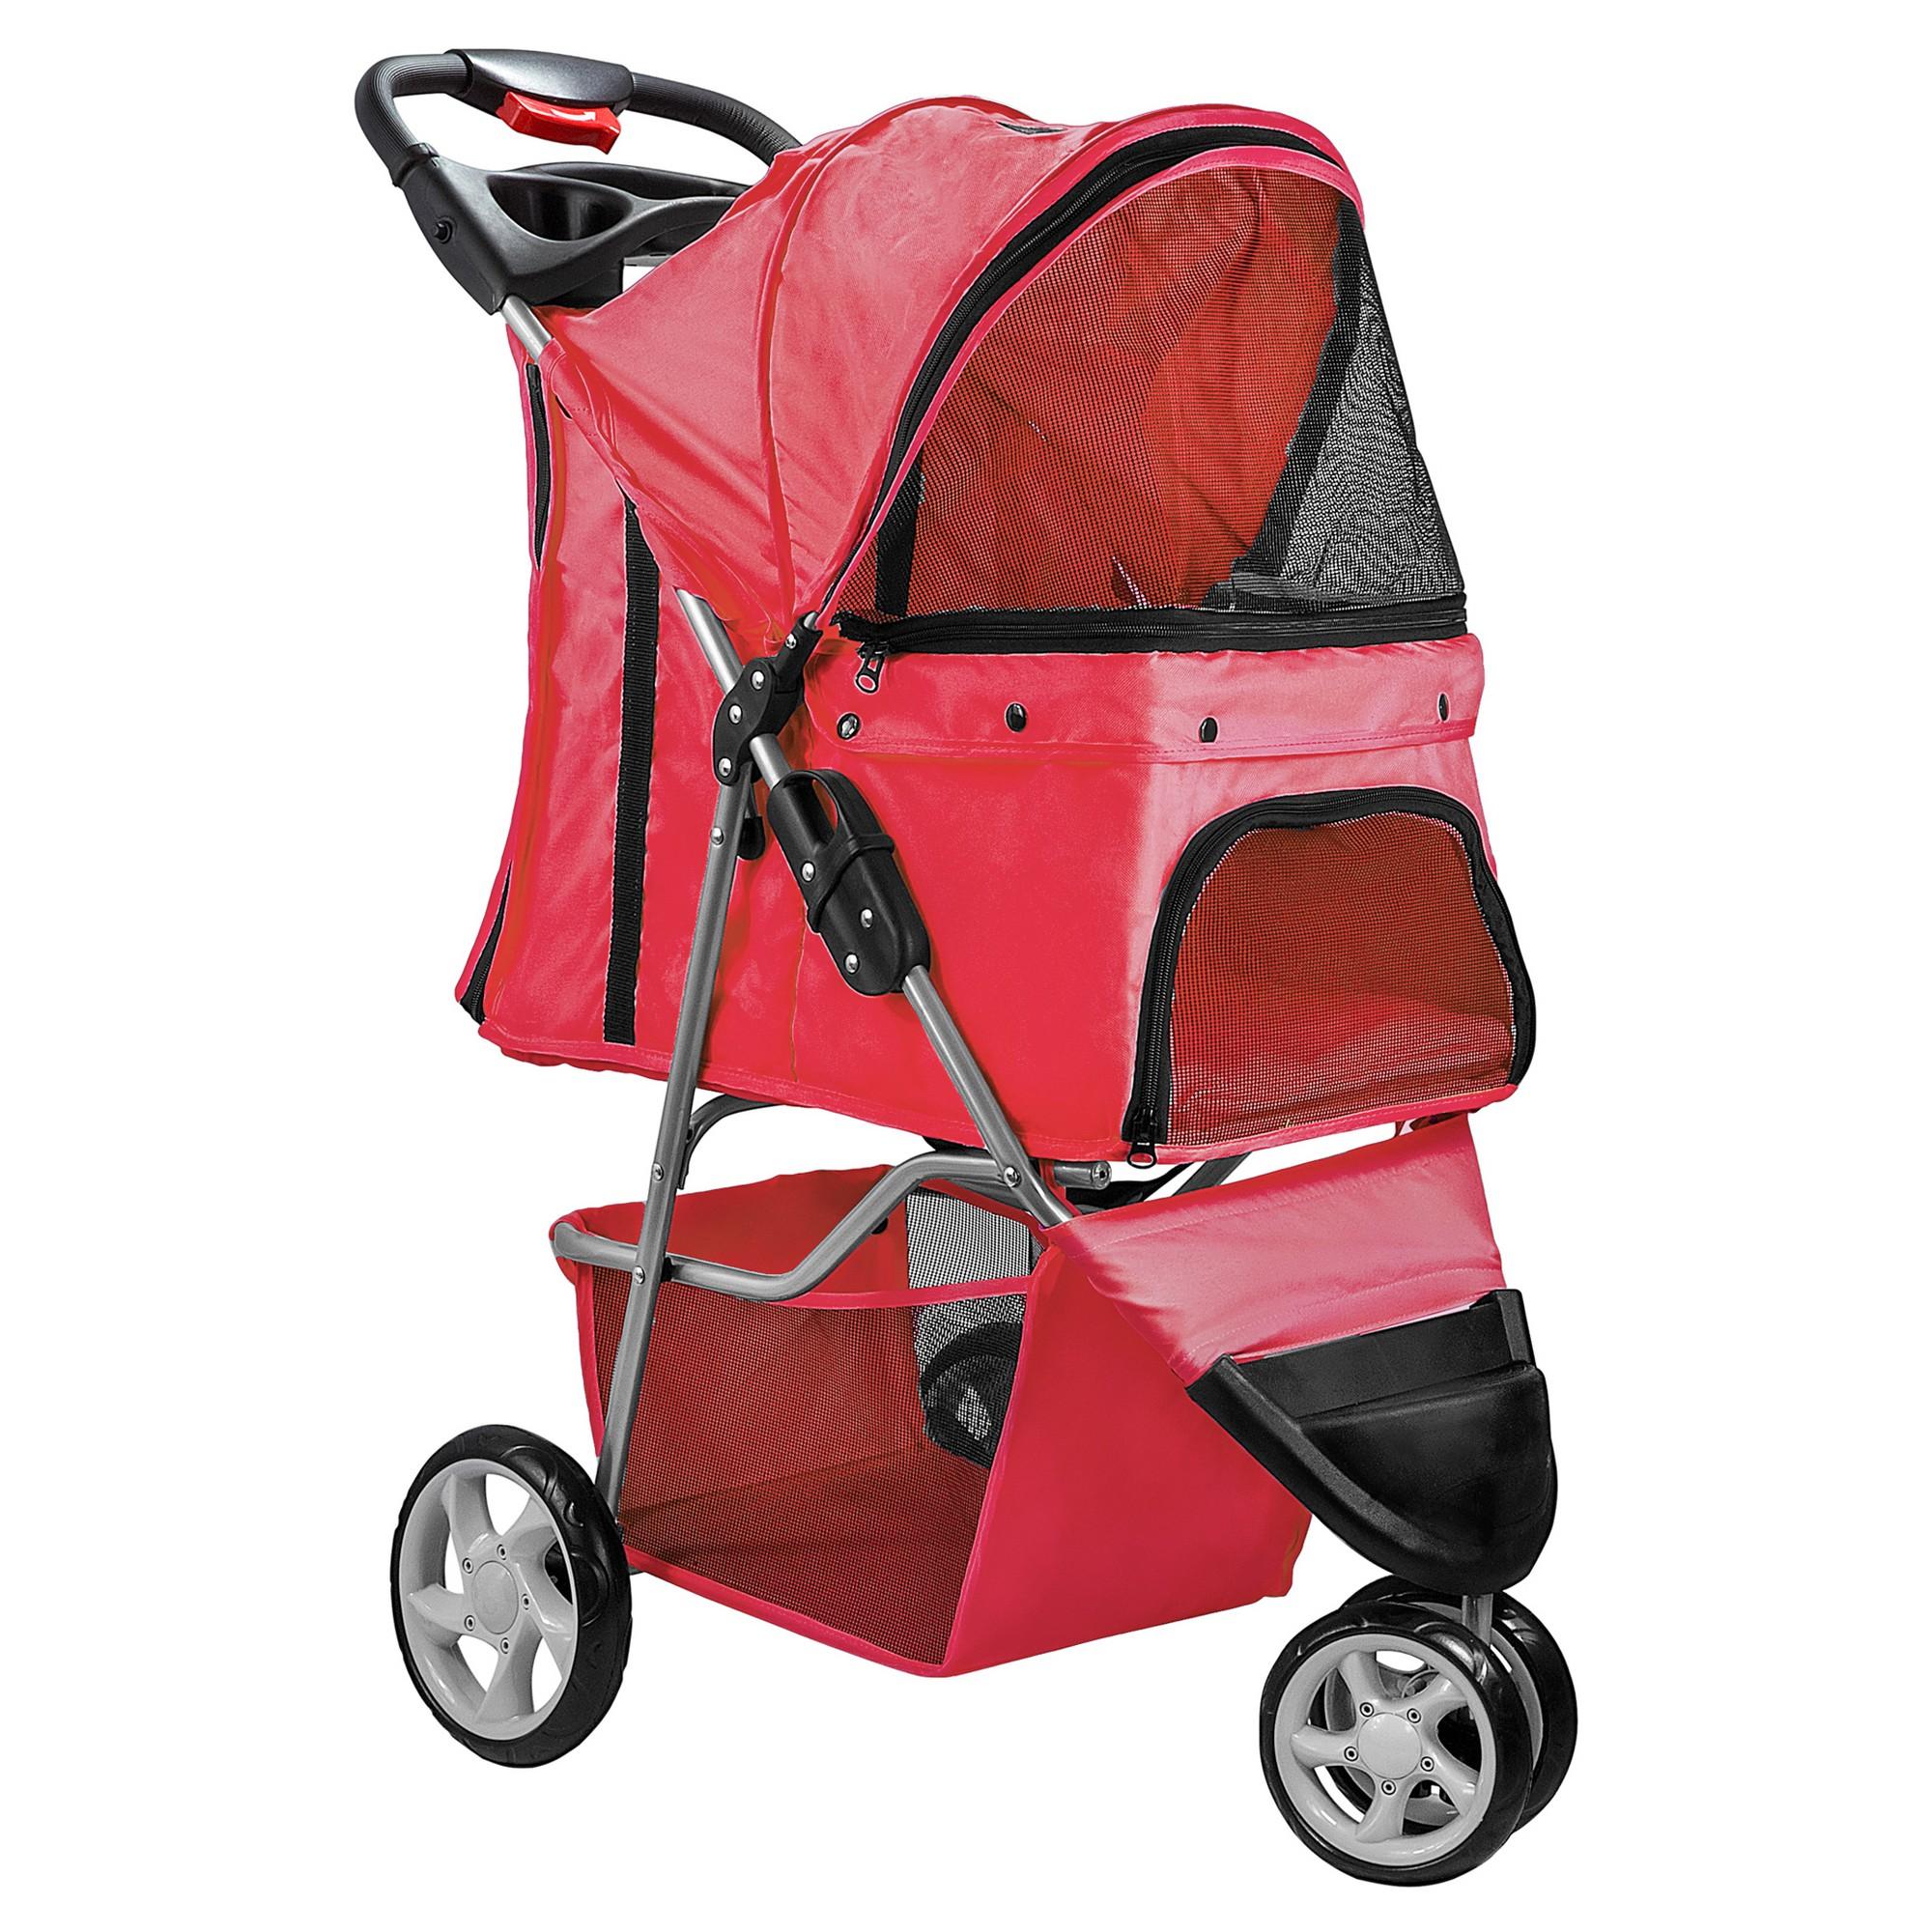 Paws pals 3wheel jogger pet stroller red pet